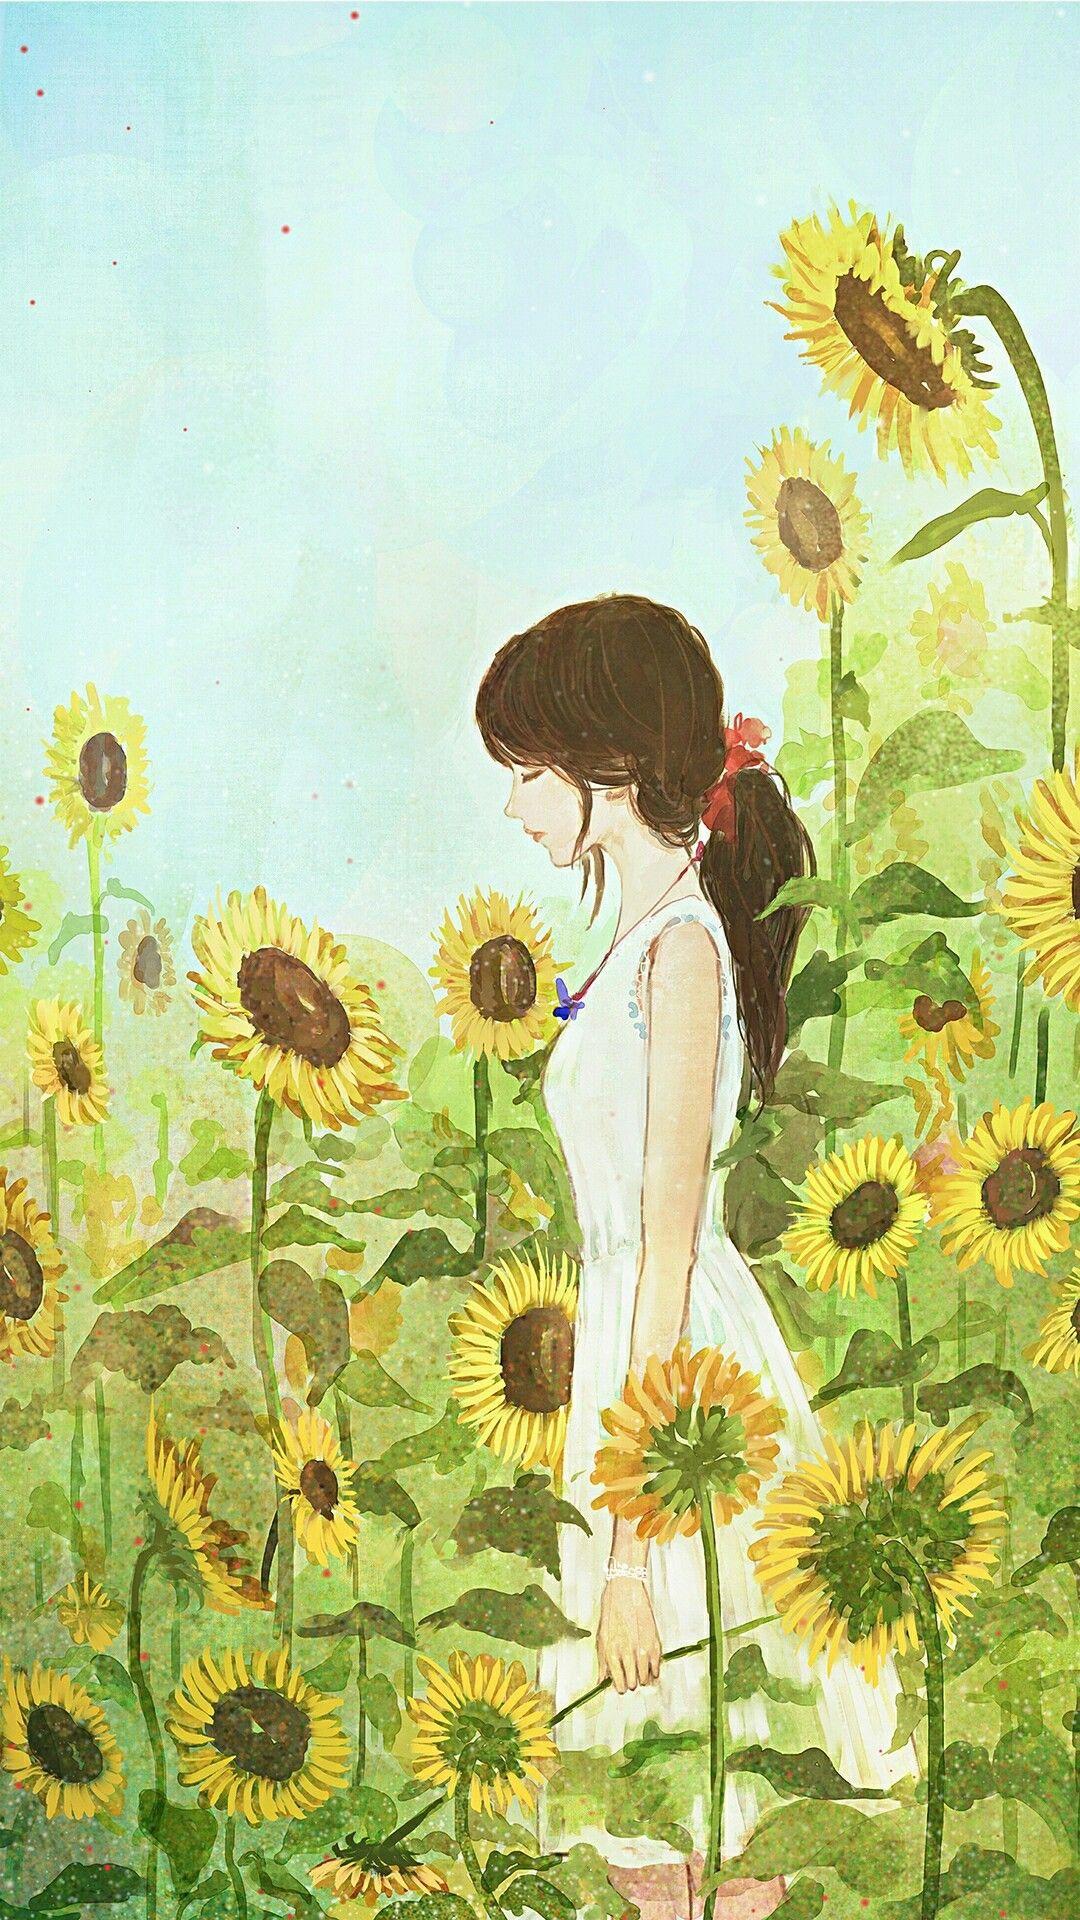 소녀 일러스트with sunflower Hoa Hướng Dương, Nghệ Thuật Màu Nước, Màu Nước,